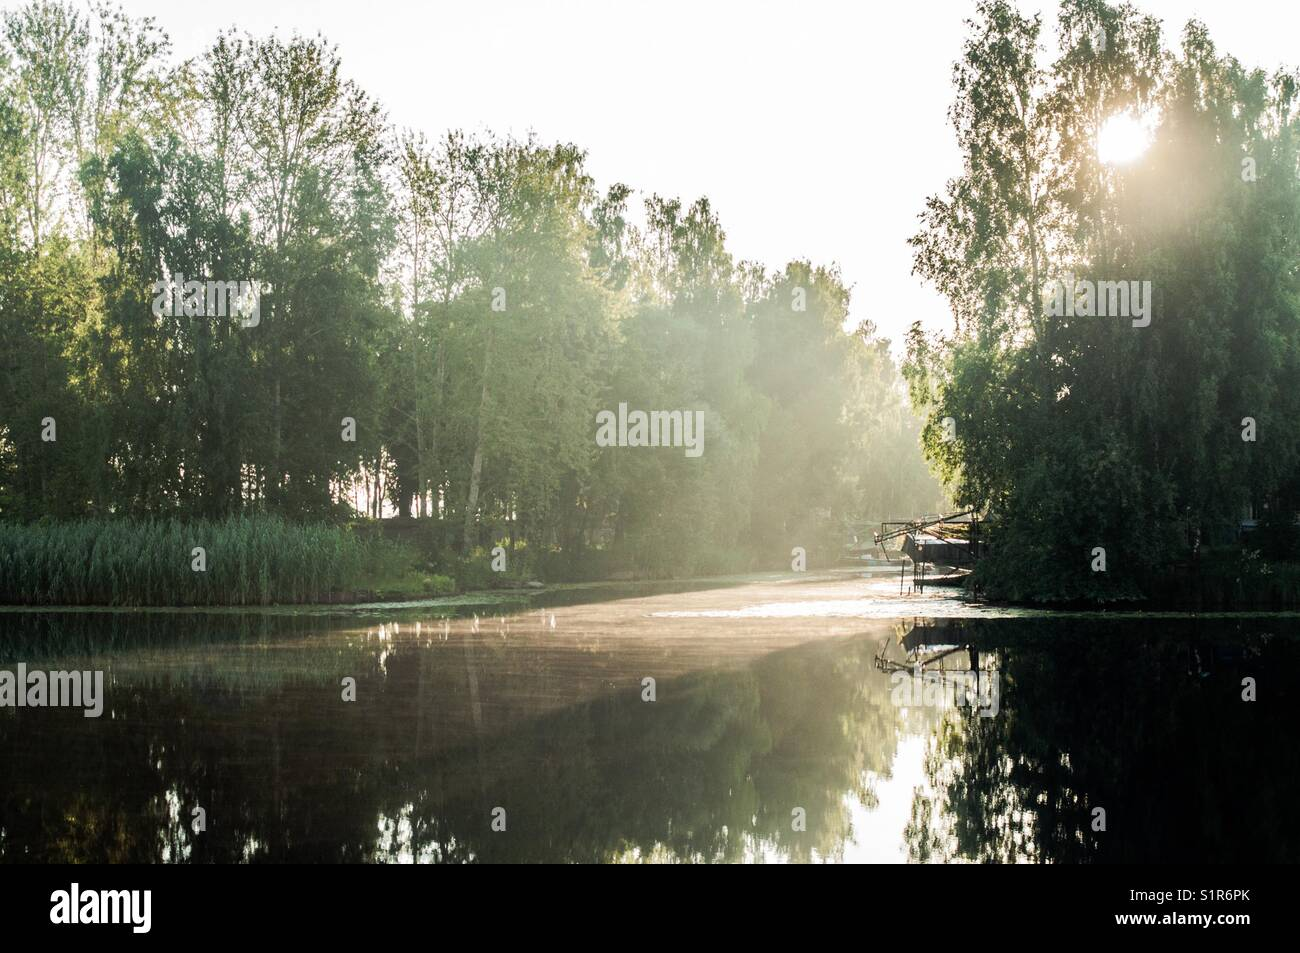 Morning on the lake. - Stock Image